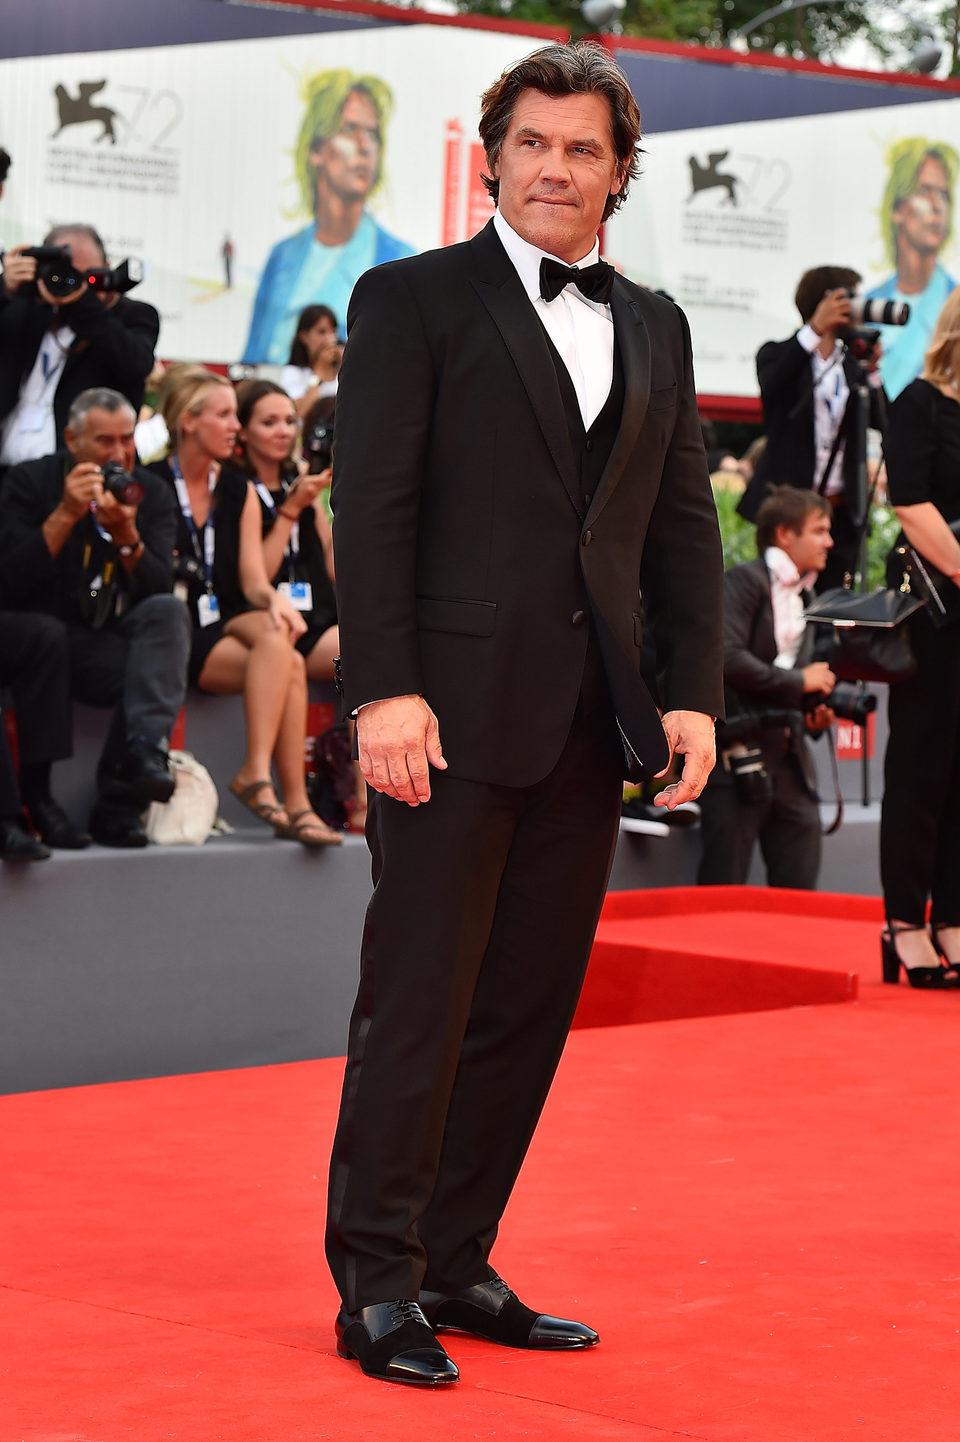 Josh Brolin at the 72nd Venice Film Festival